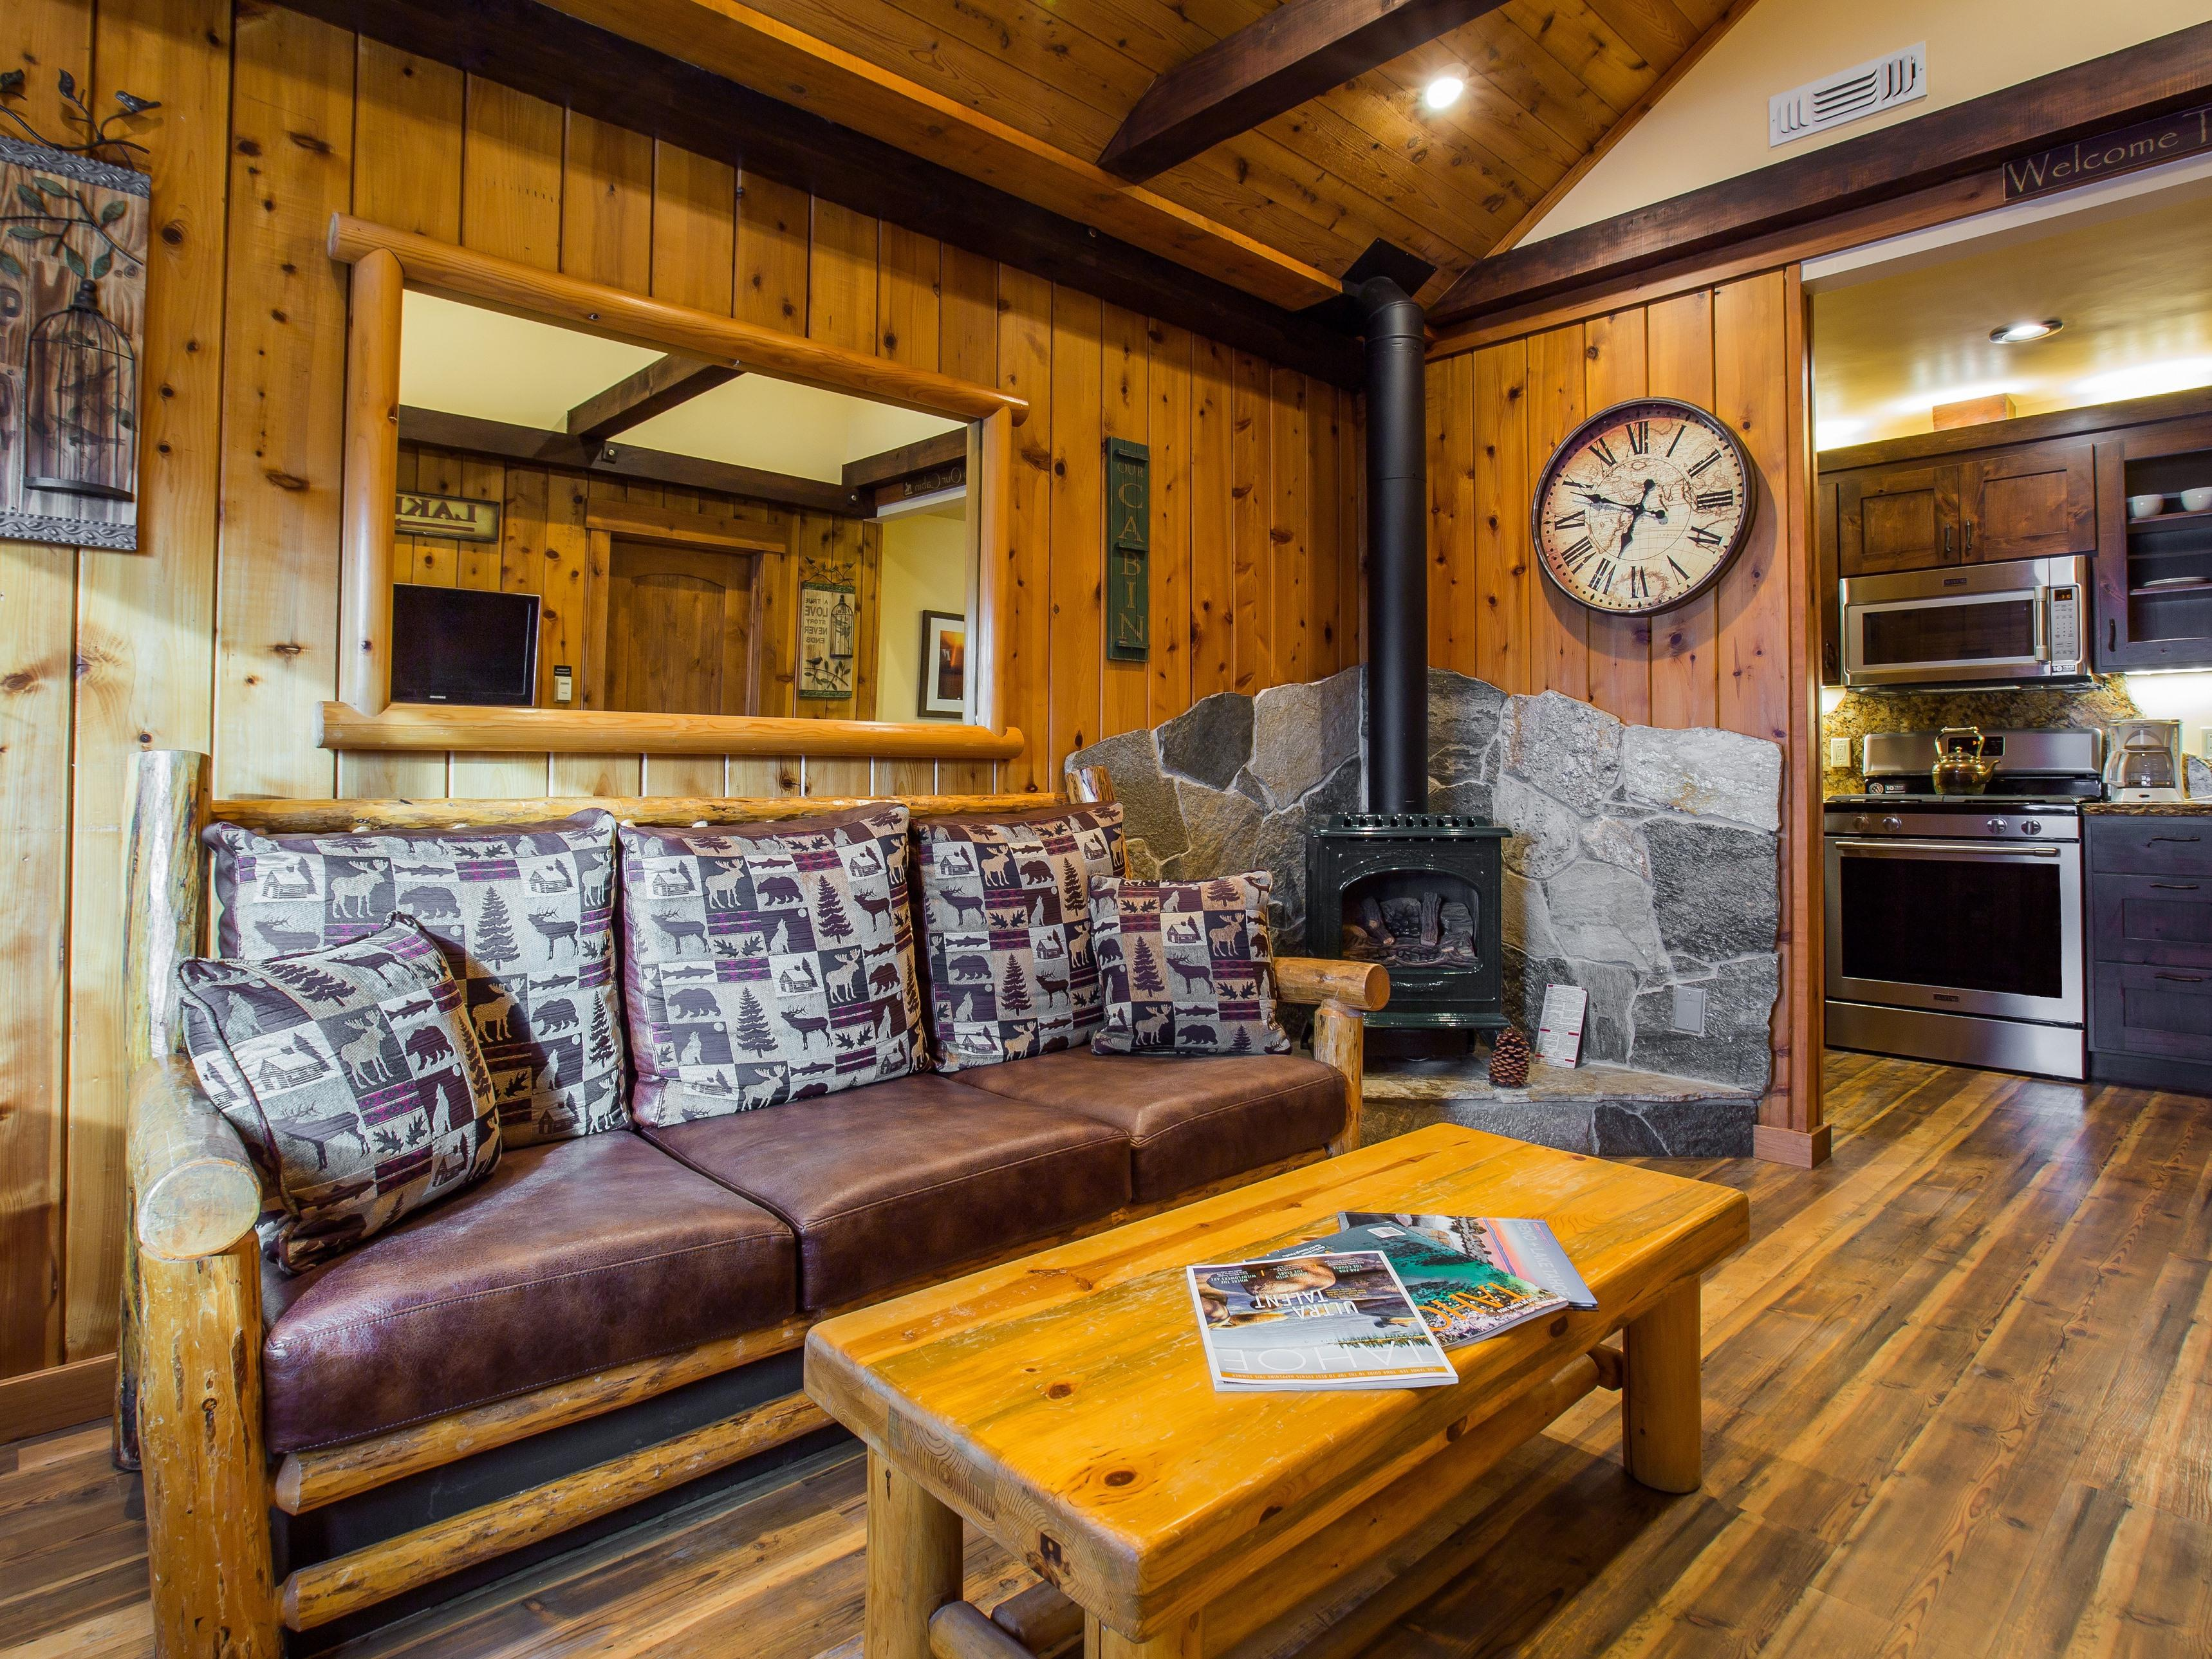 Romance Suite #6-Cabin-Honeymoon-Ensuite with Jet bath-Garden View - Base Rate